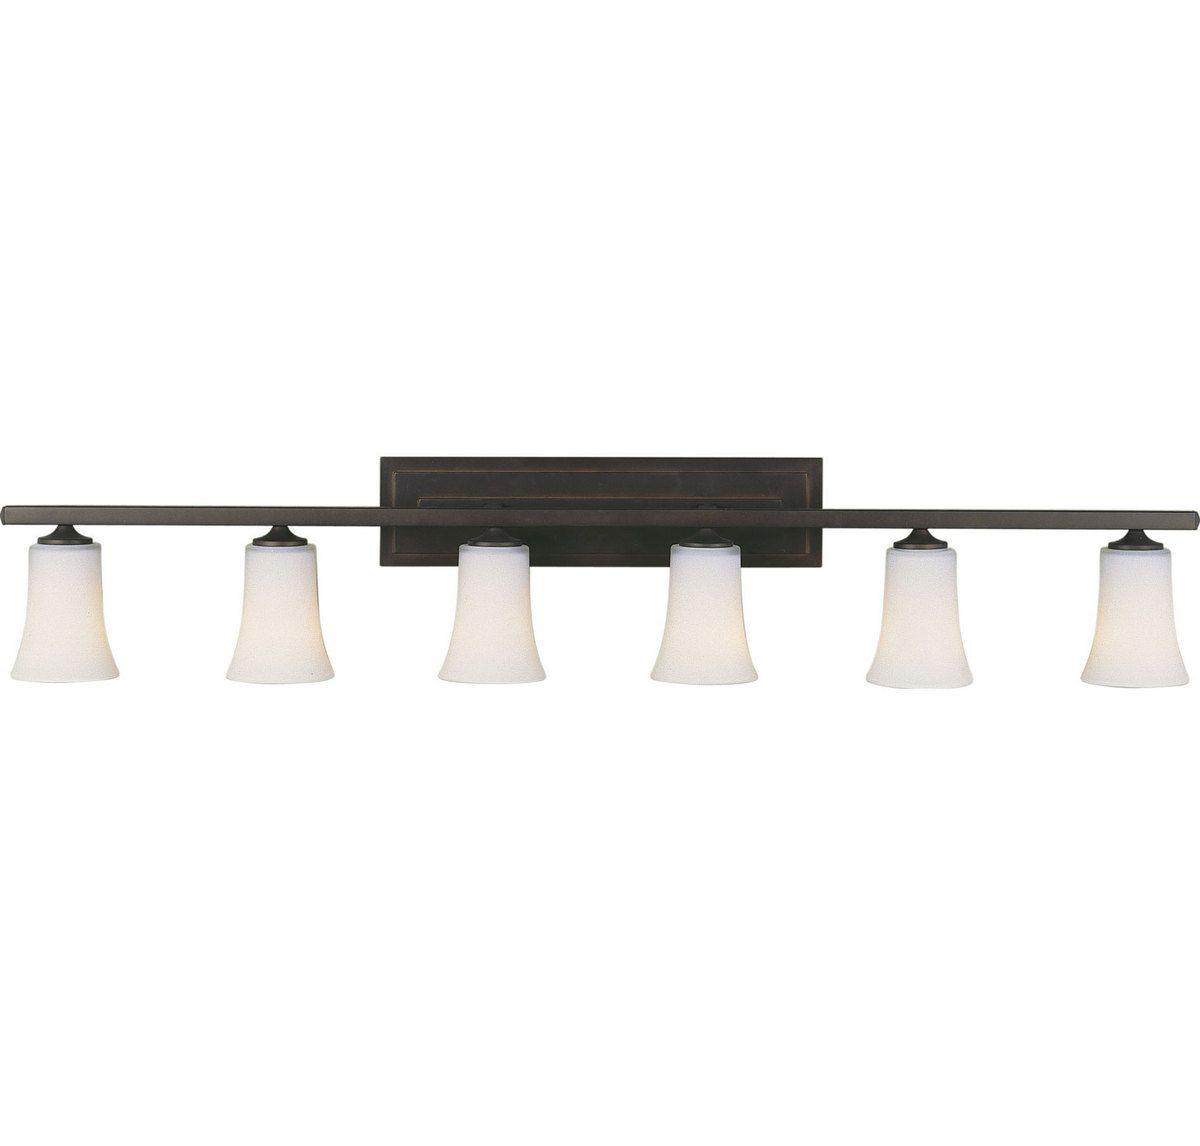 Feiss Boulevard Collection 6 Light Vanity Strip In Bronze